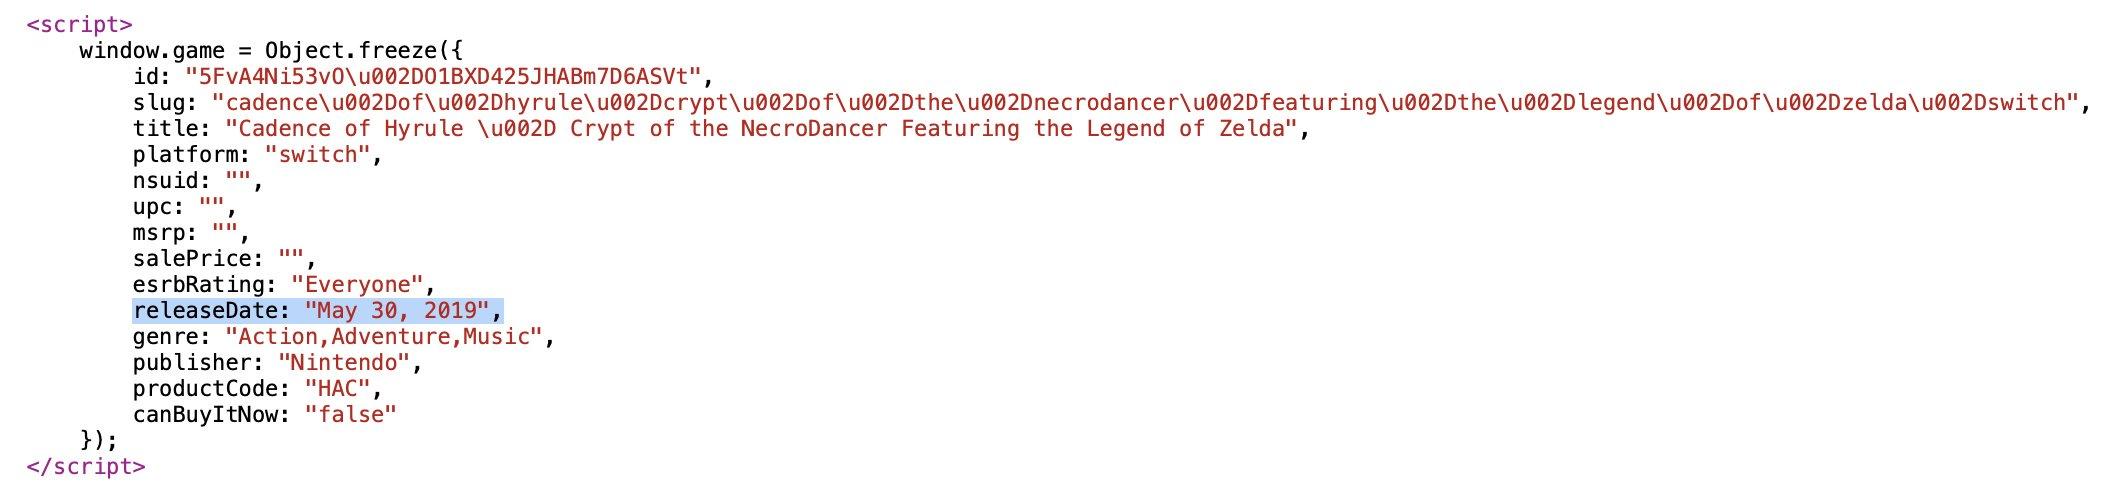 <b>商店HTML代码泄露天机 《节奏海拉鲁》或于6.20发售</b>